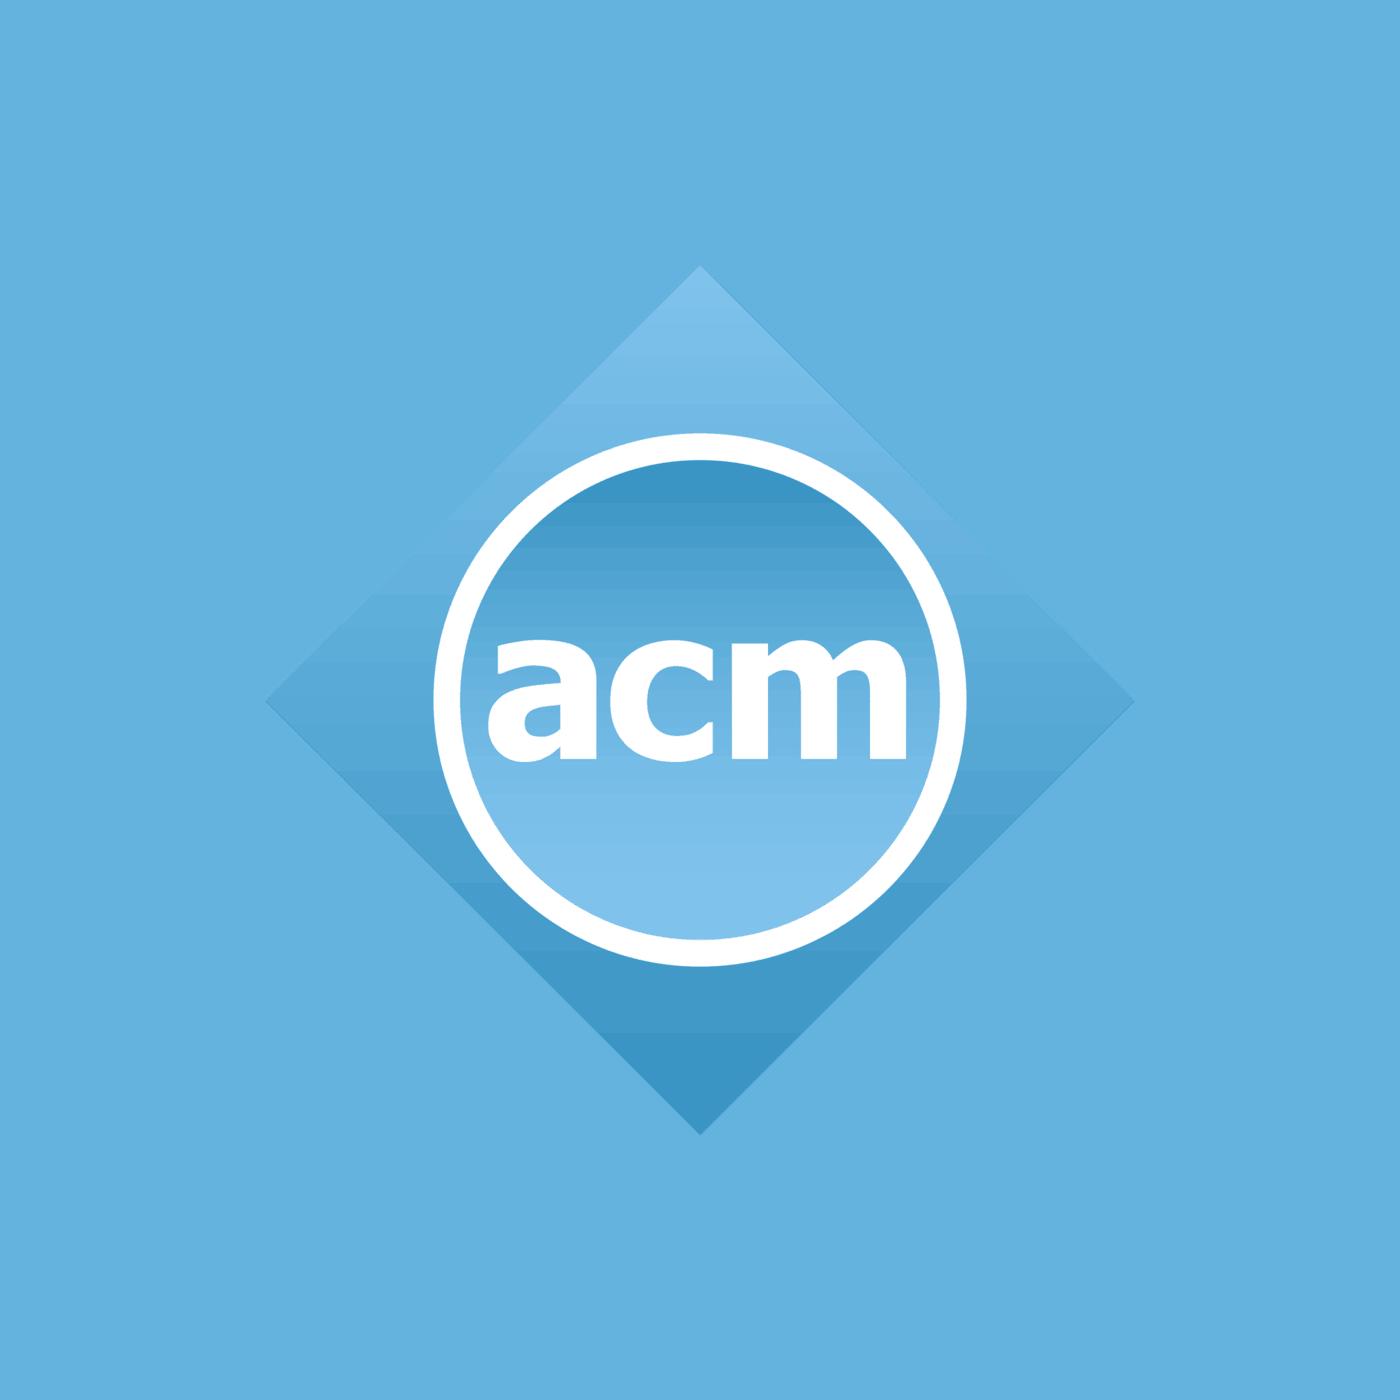 ACM icon